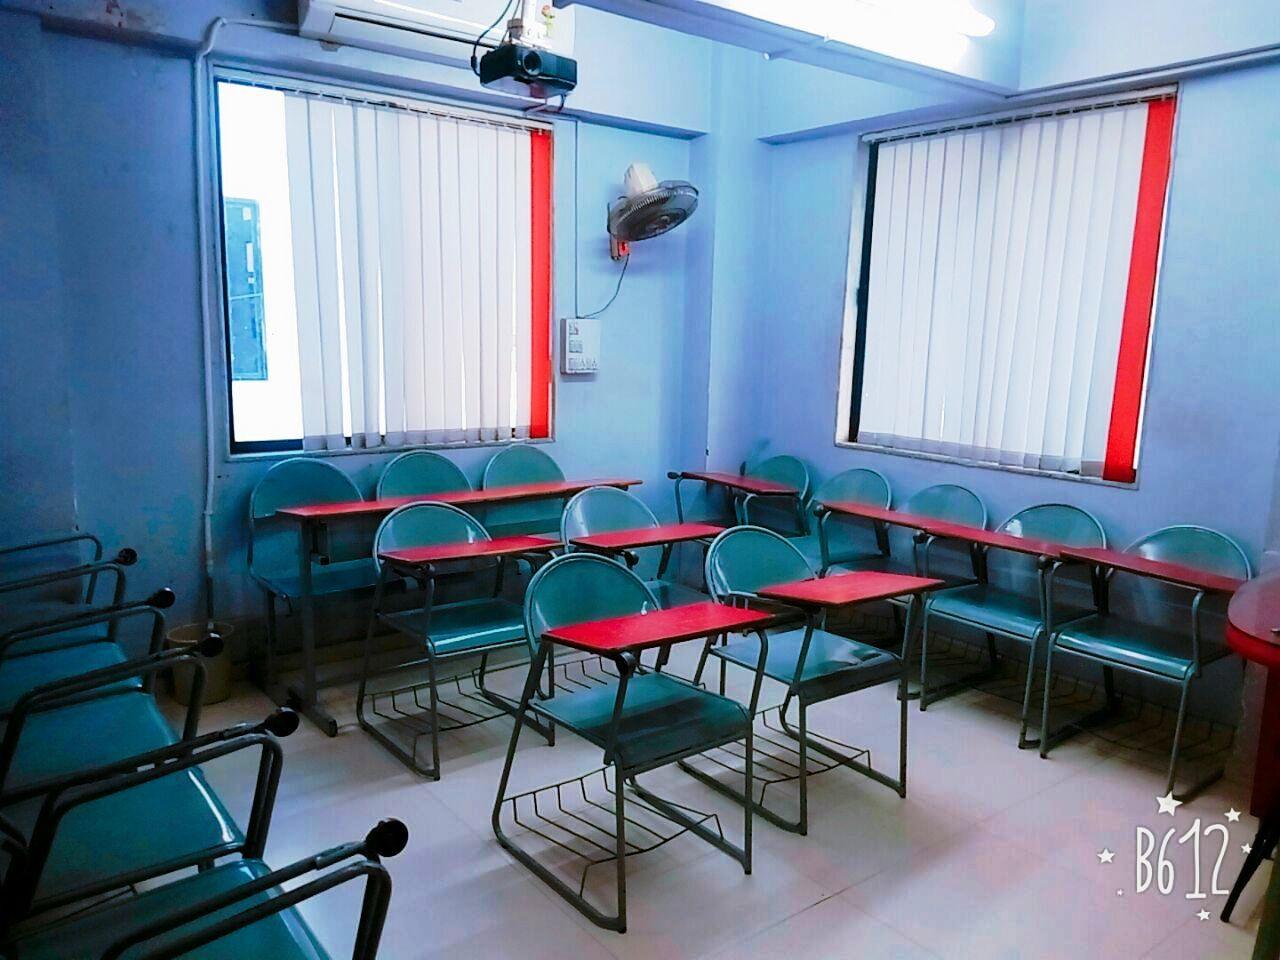 Gallery British Academy Spoken English Ielts Pte Toefl Gre Gmat Visa Immigration In Chandkheda